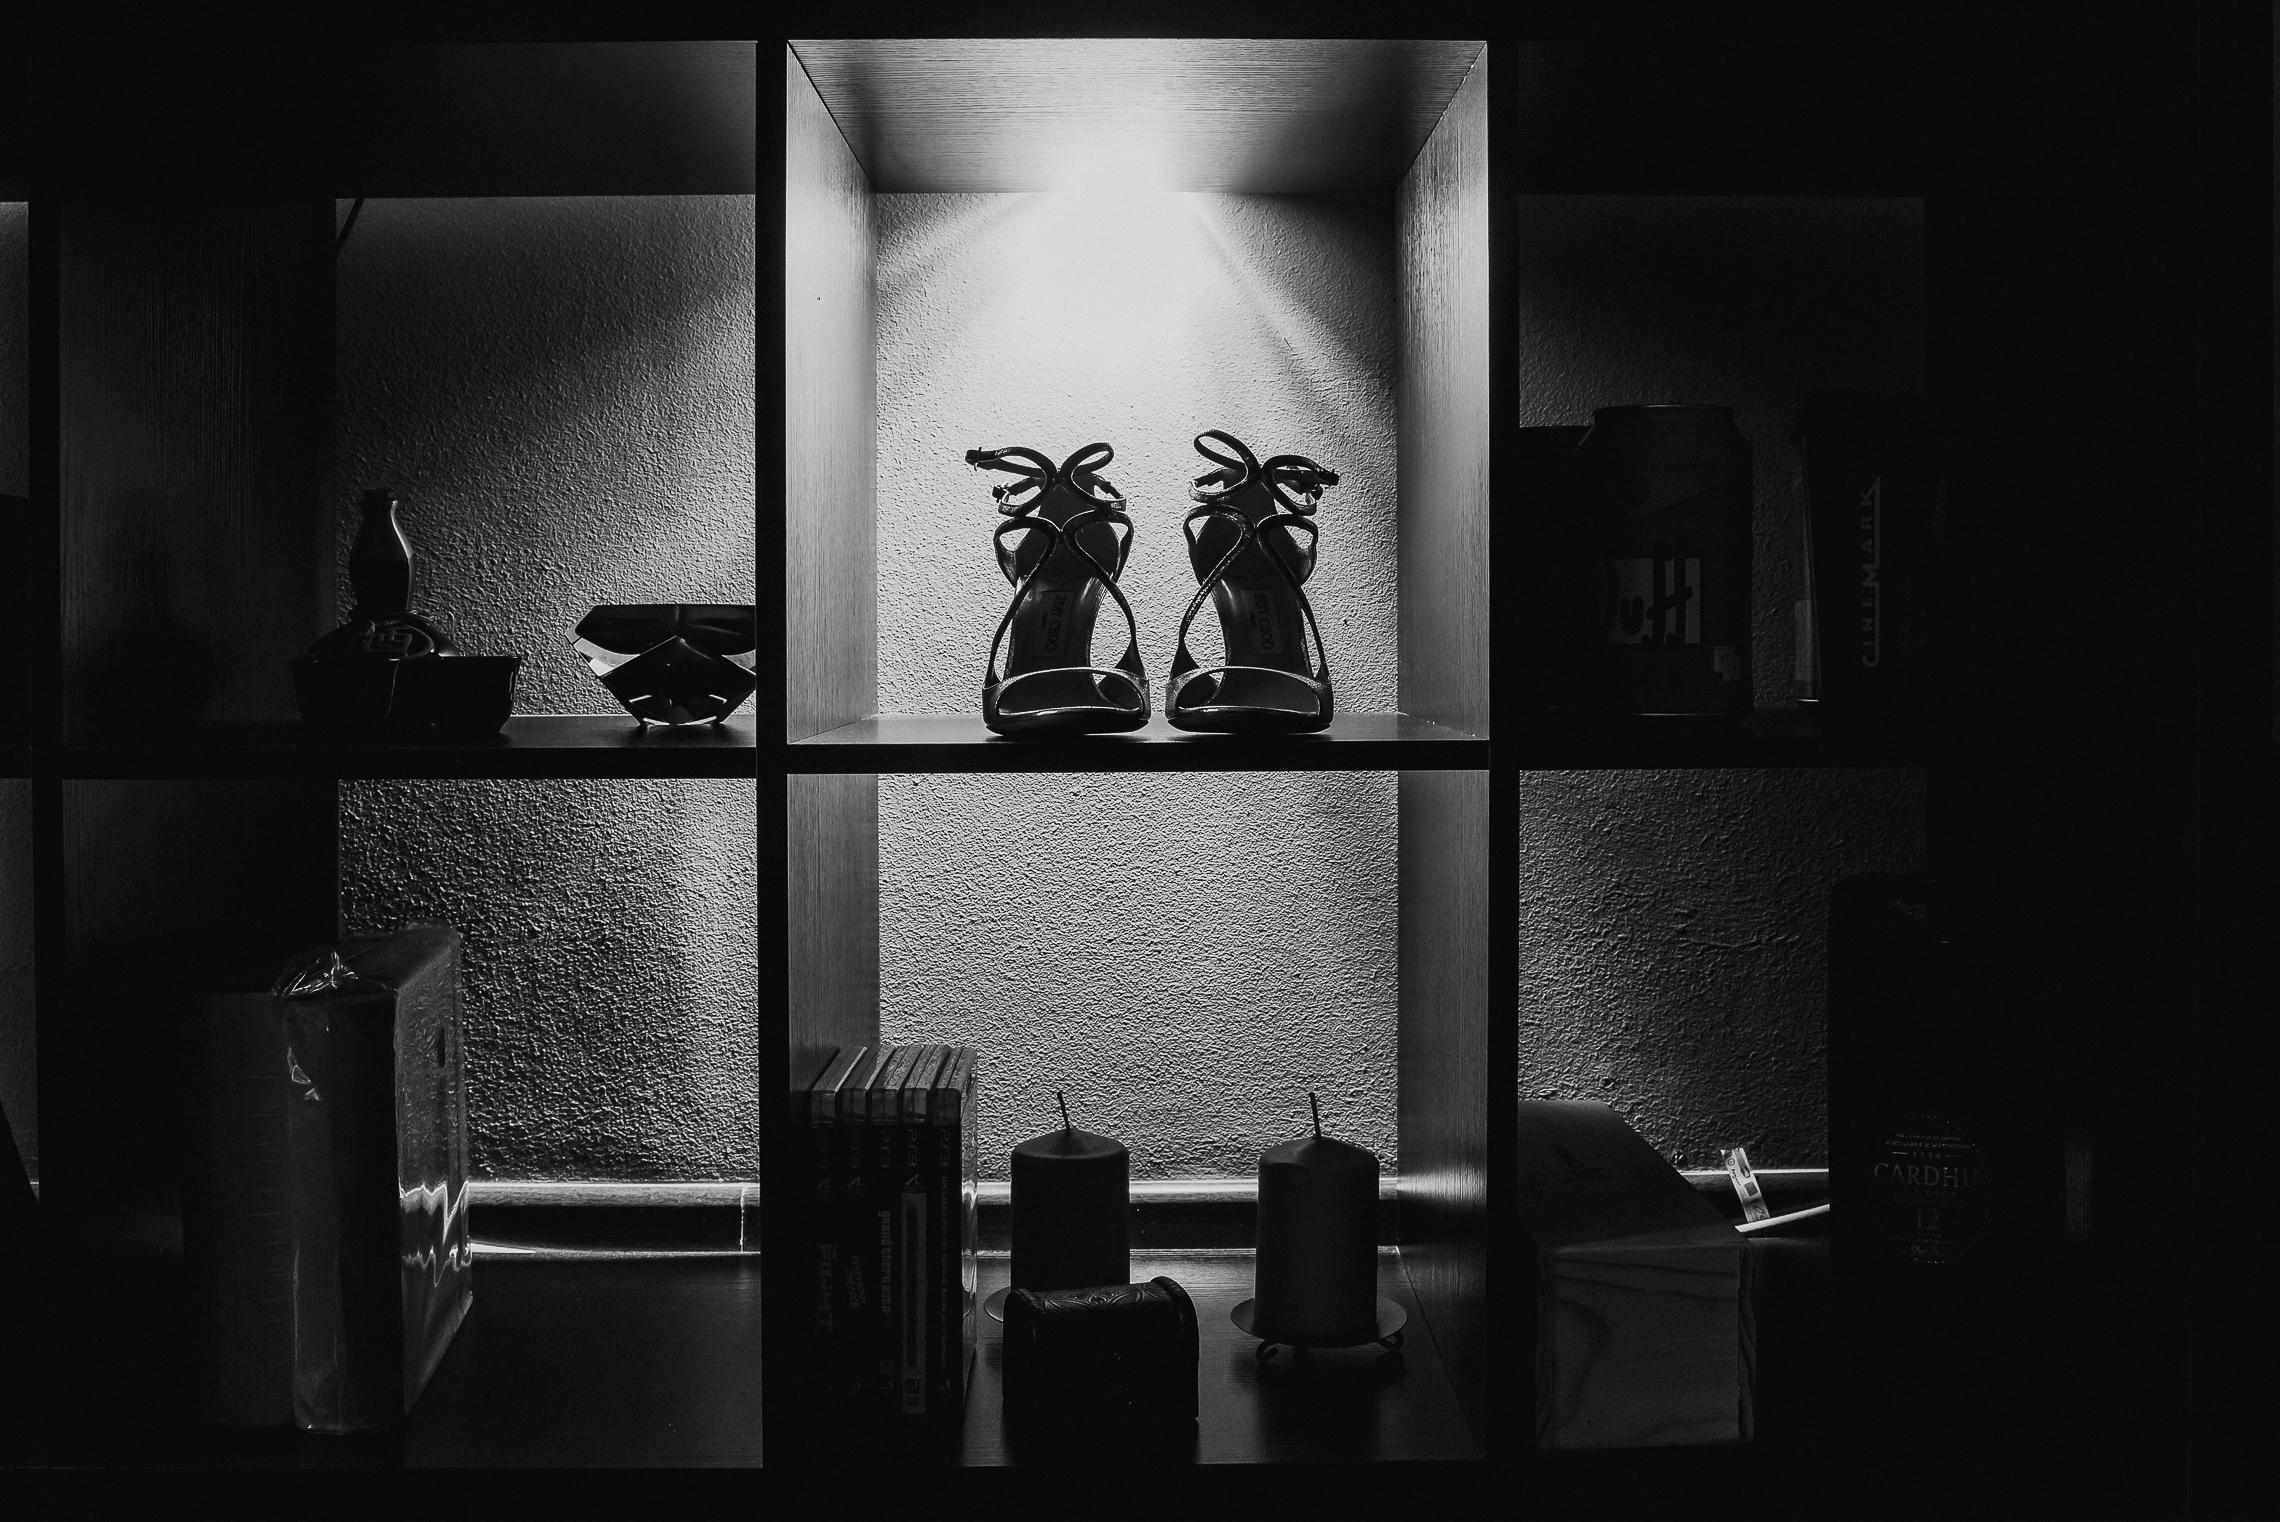 matrimonio-casona-aldunate-soledad-provens-fotografia-deborah-dantzoff-fotografo-boda-chile 01